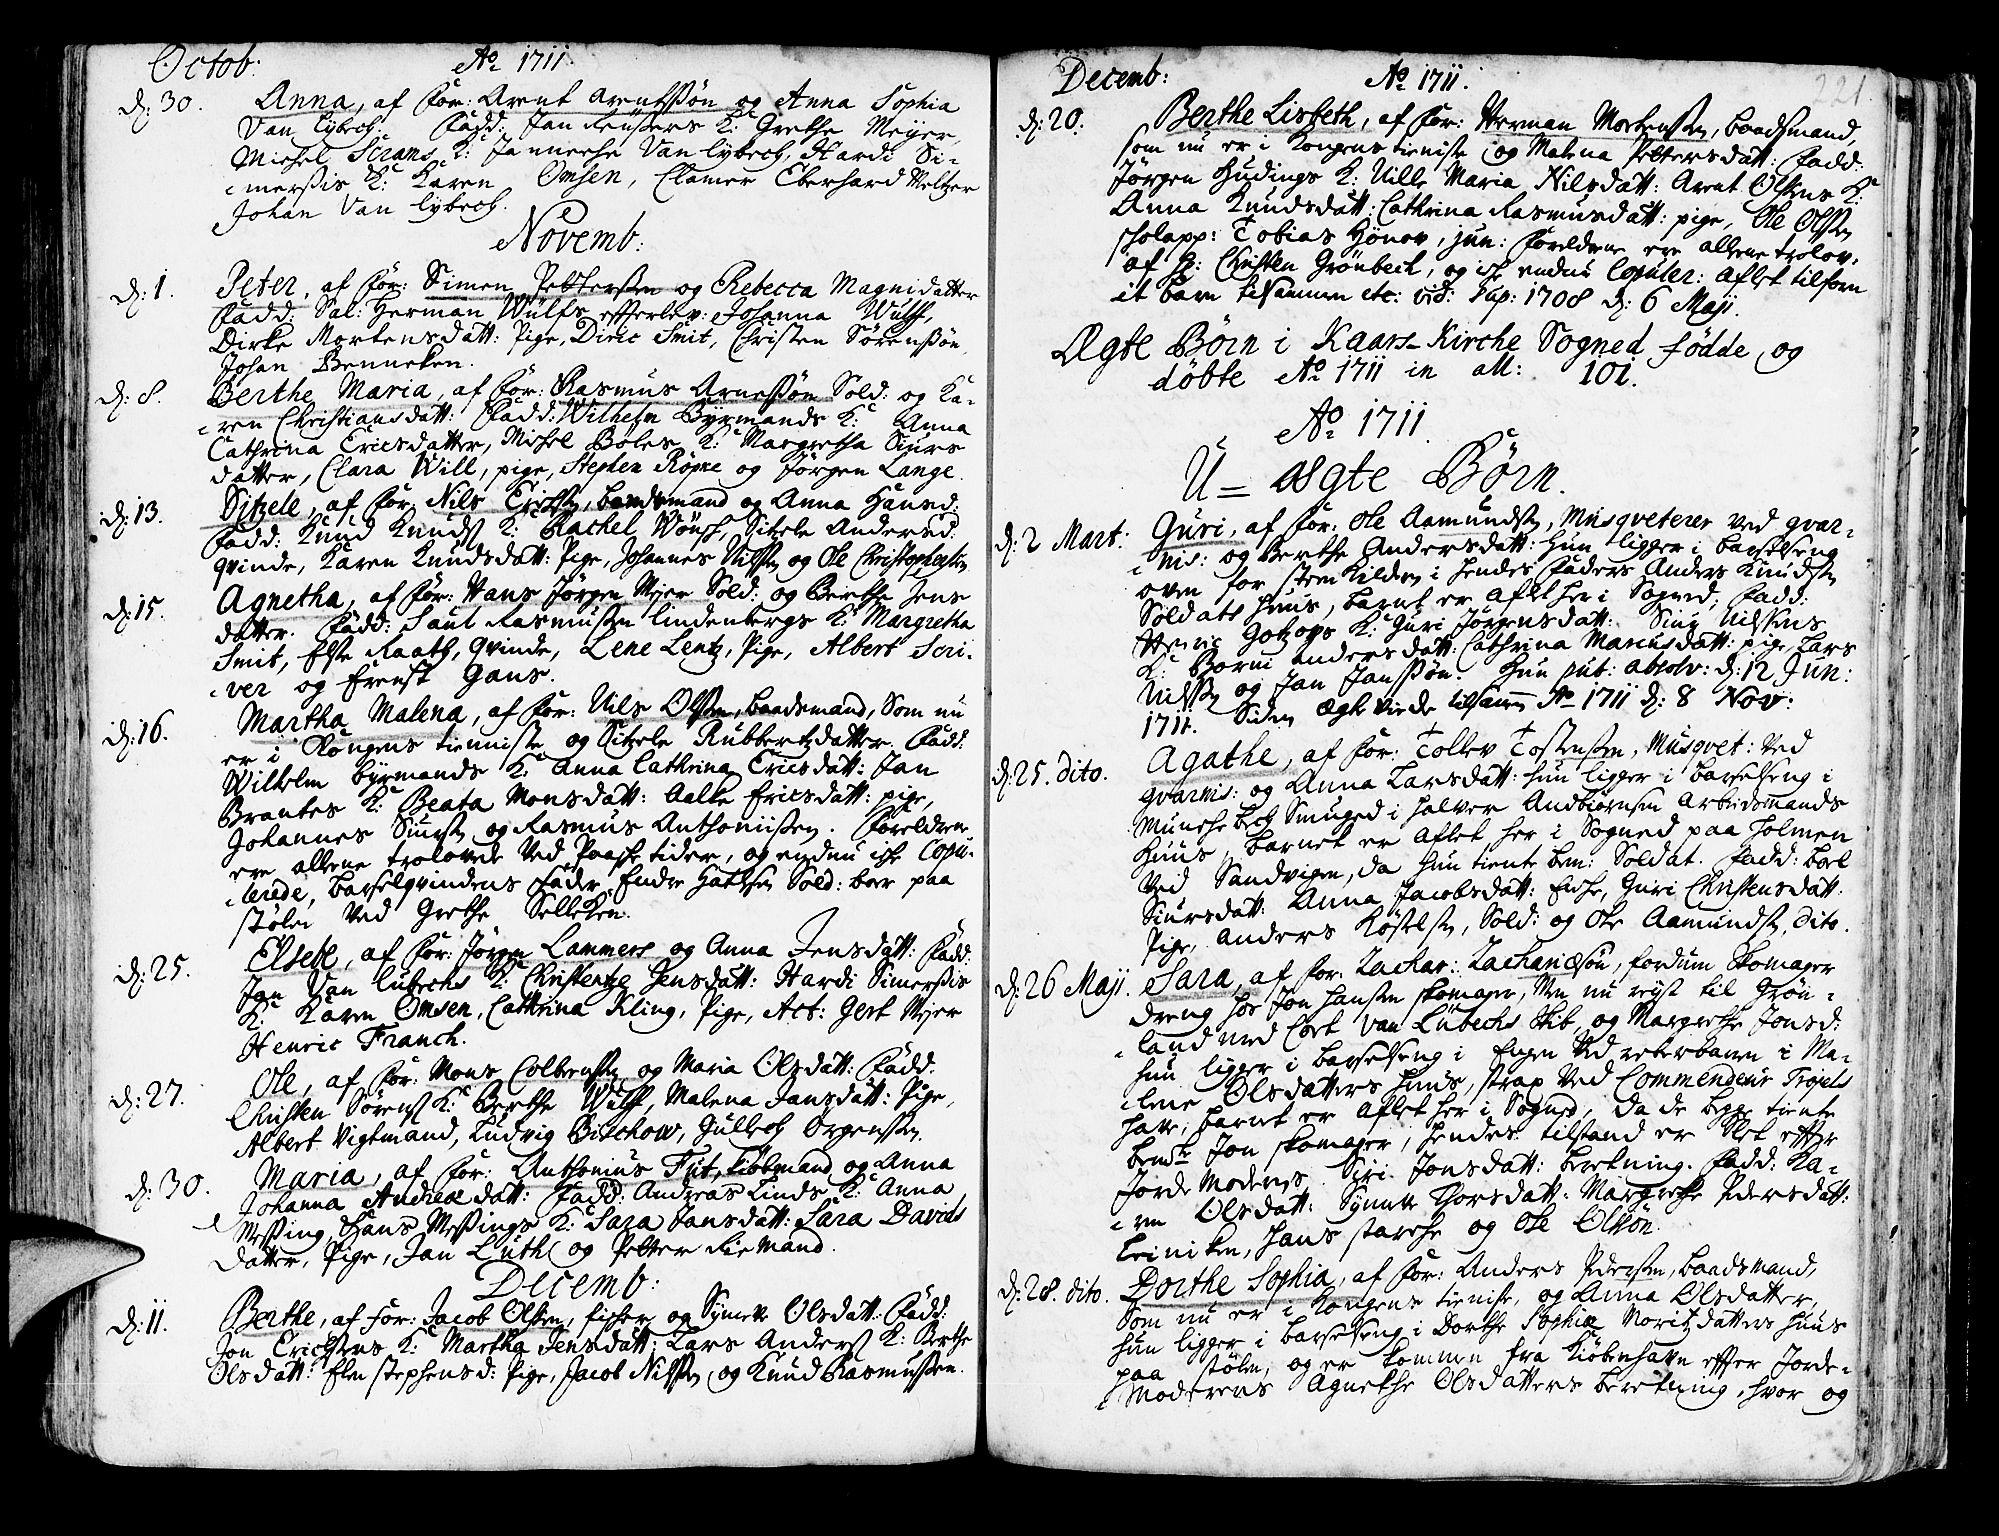 SAB, Korskirken Sokneprestembete, H/Haa/L0003: Ministerialbok nr. A 3, 1698-1719, s. 221